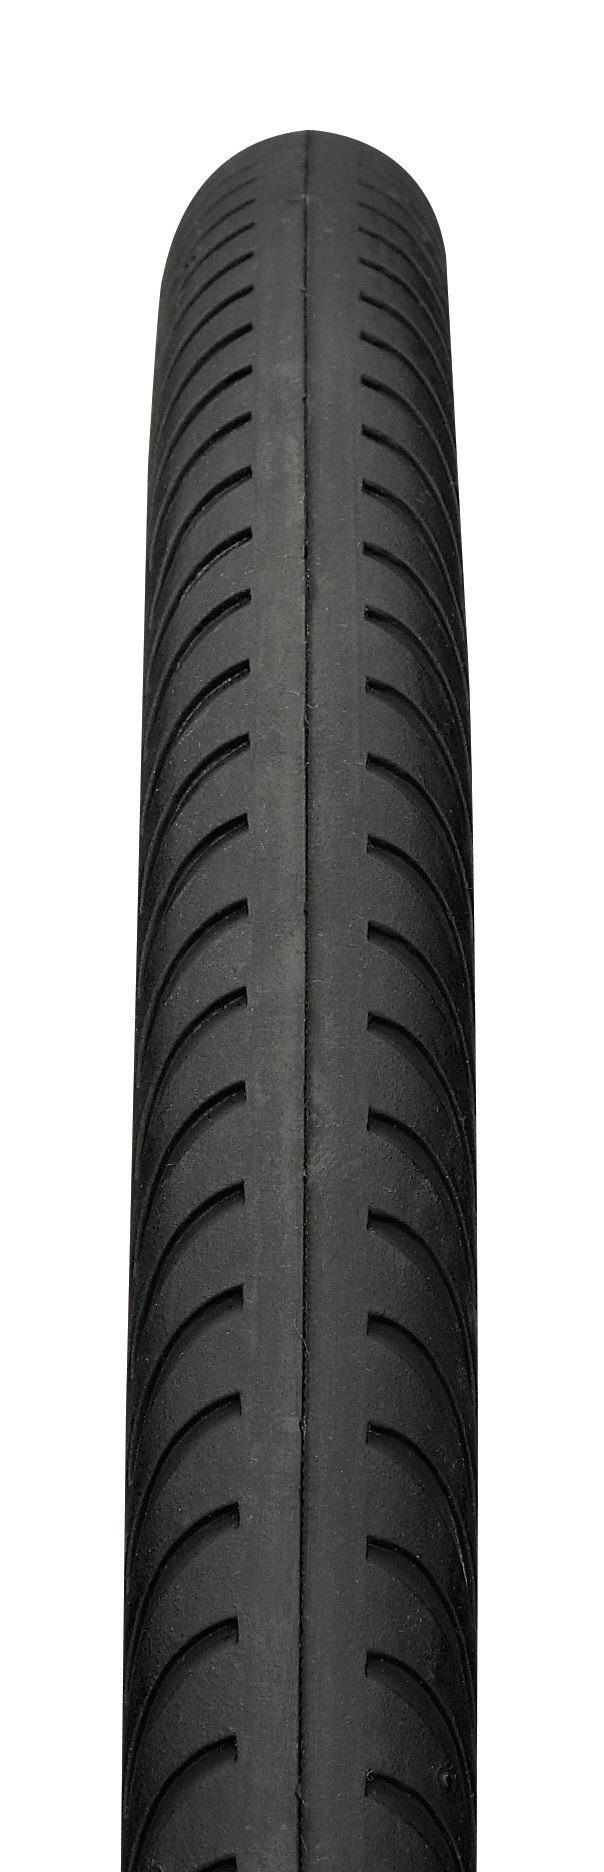 Ritchey Fahrradreifen »Comp Tom Slick Reifen 27,5 Zoll faltbar«